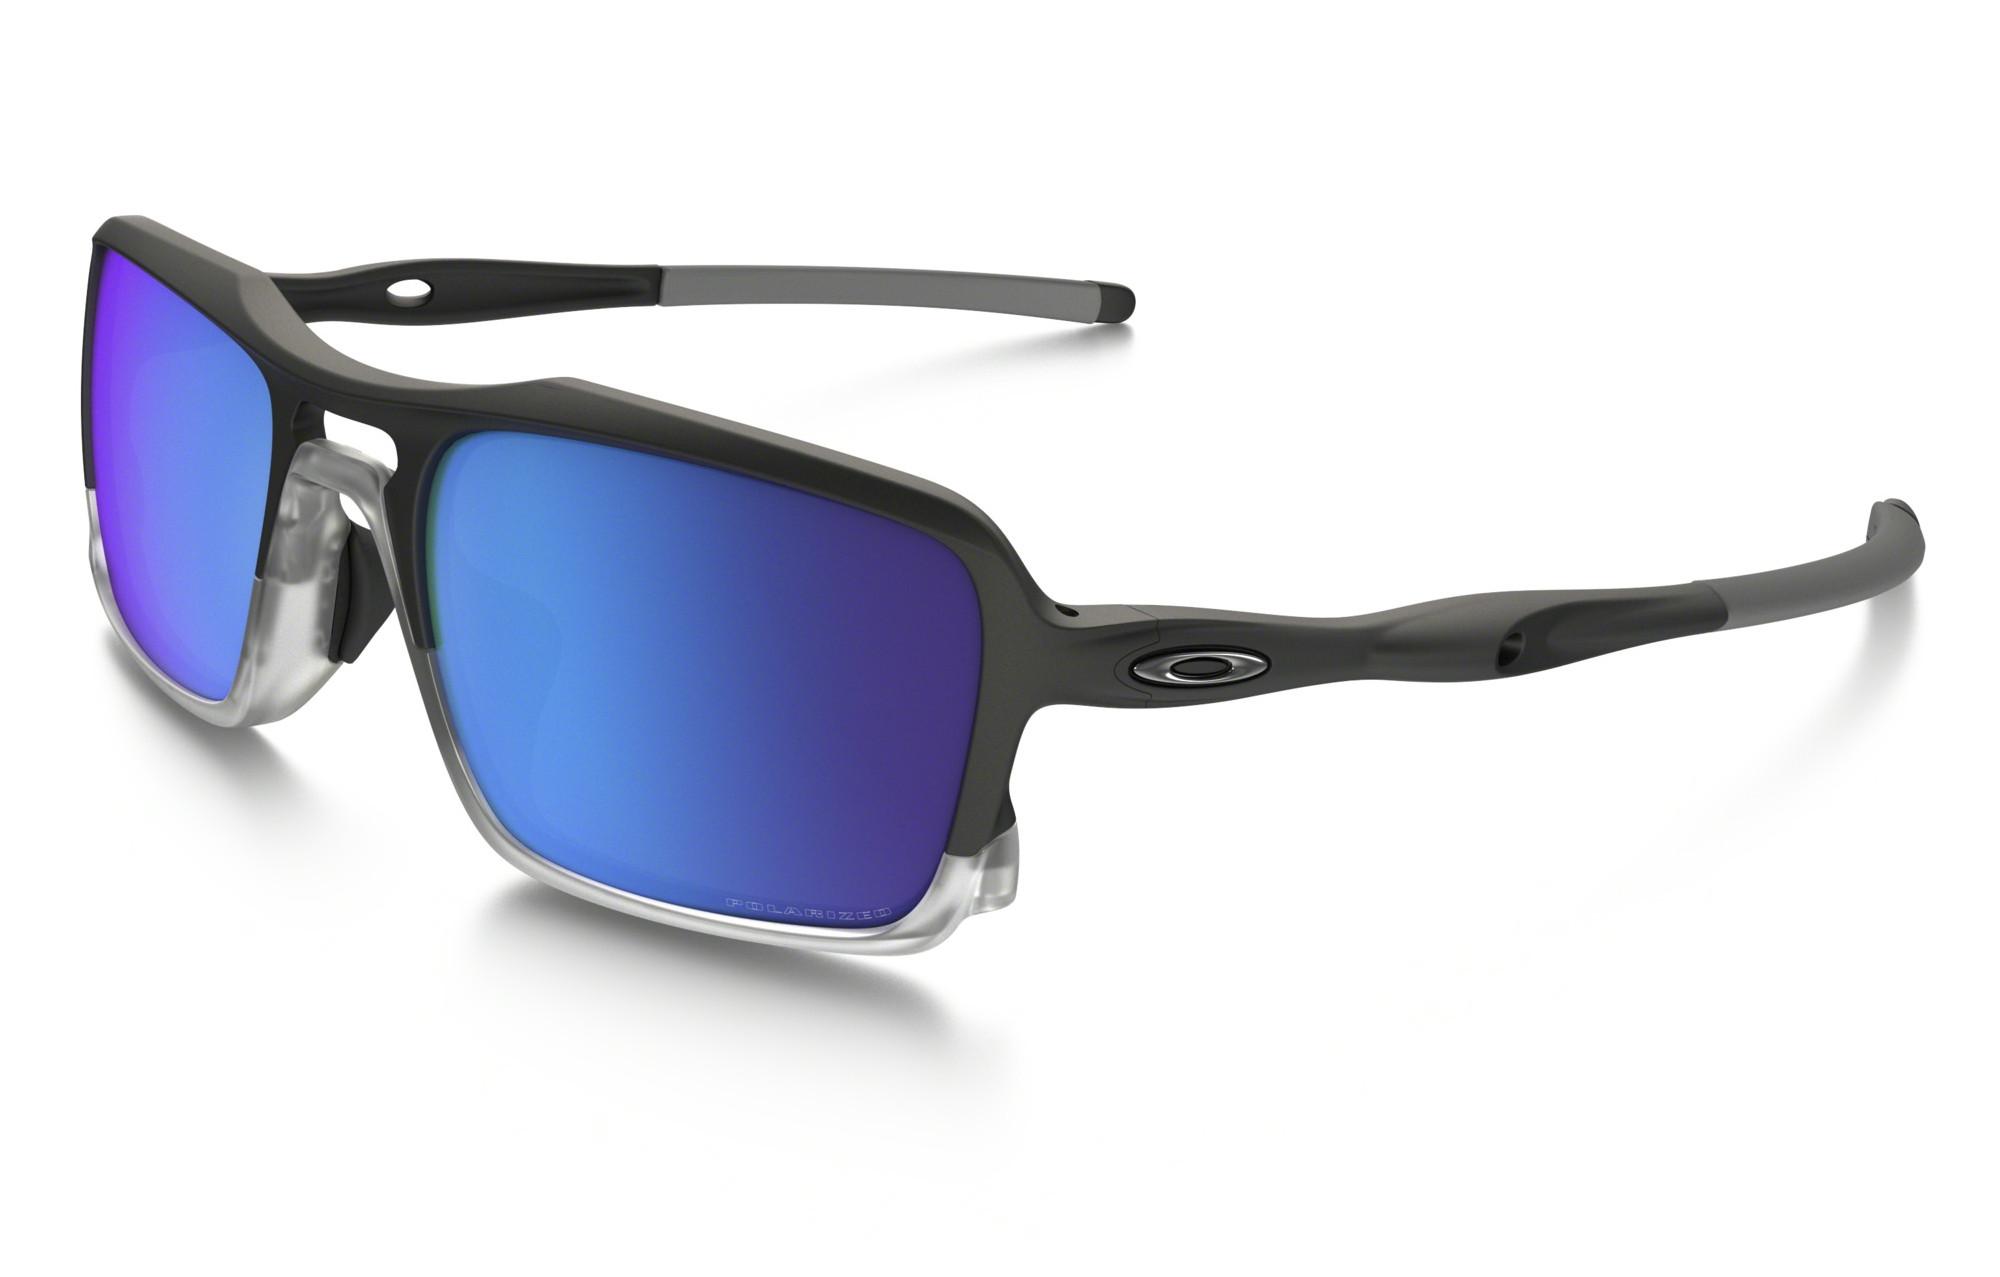 31cc6bdc53 OAKLEY TRIGGERMAN Sunglasses Black - Blue Iridium Polarized Ref OO9266-04